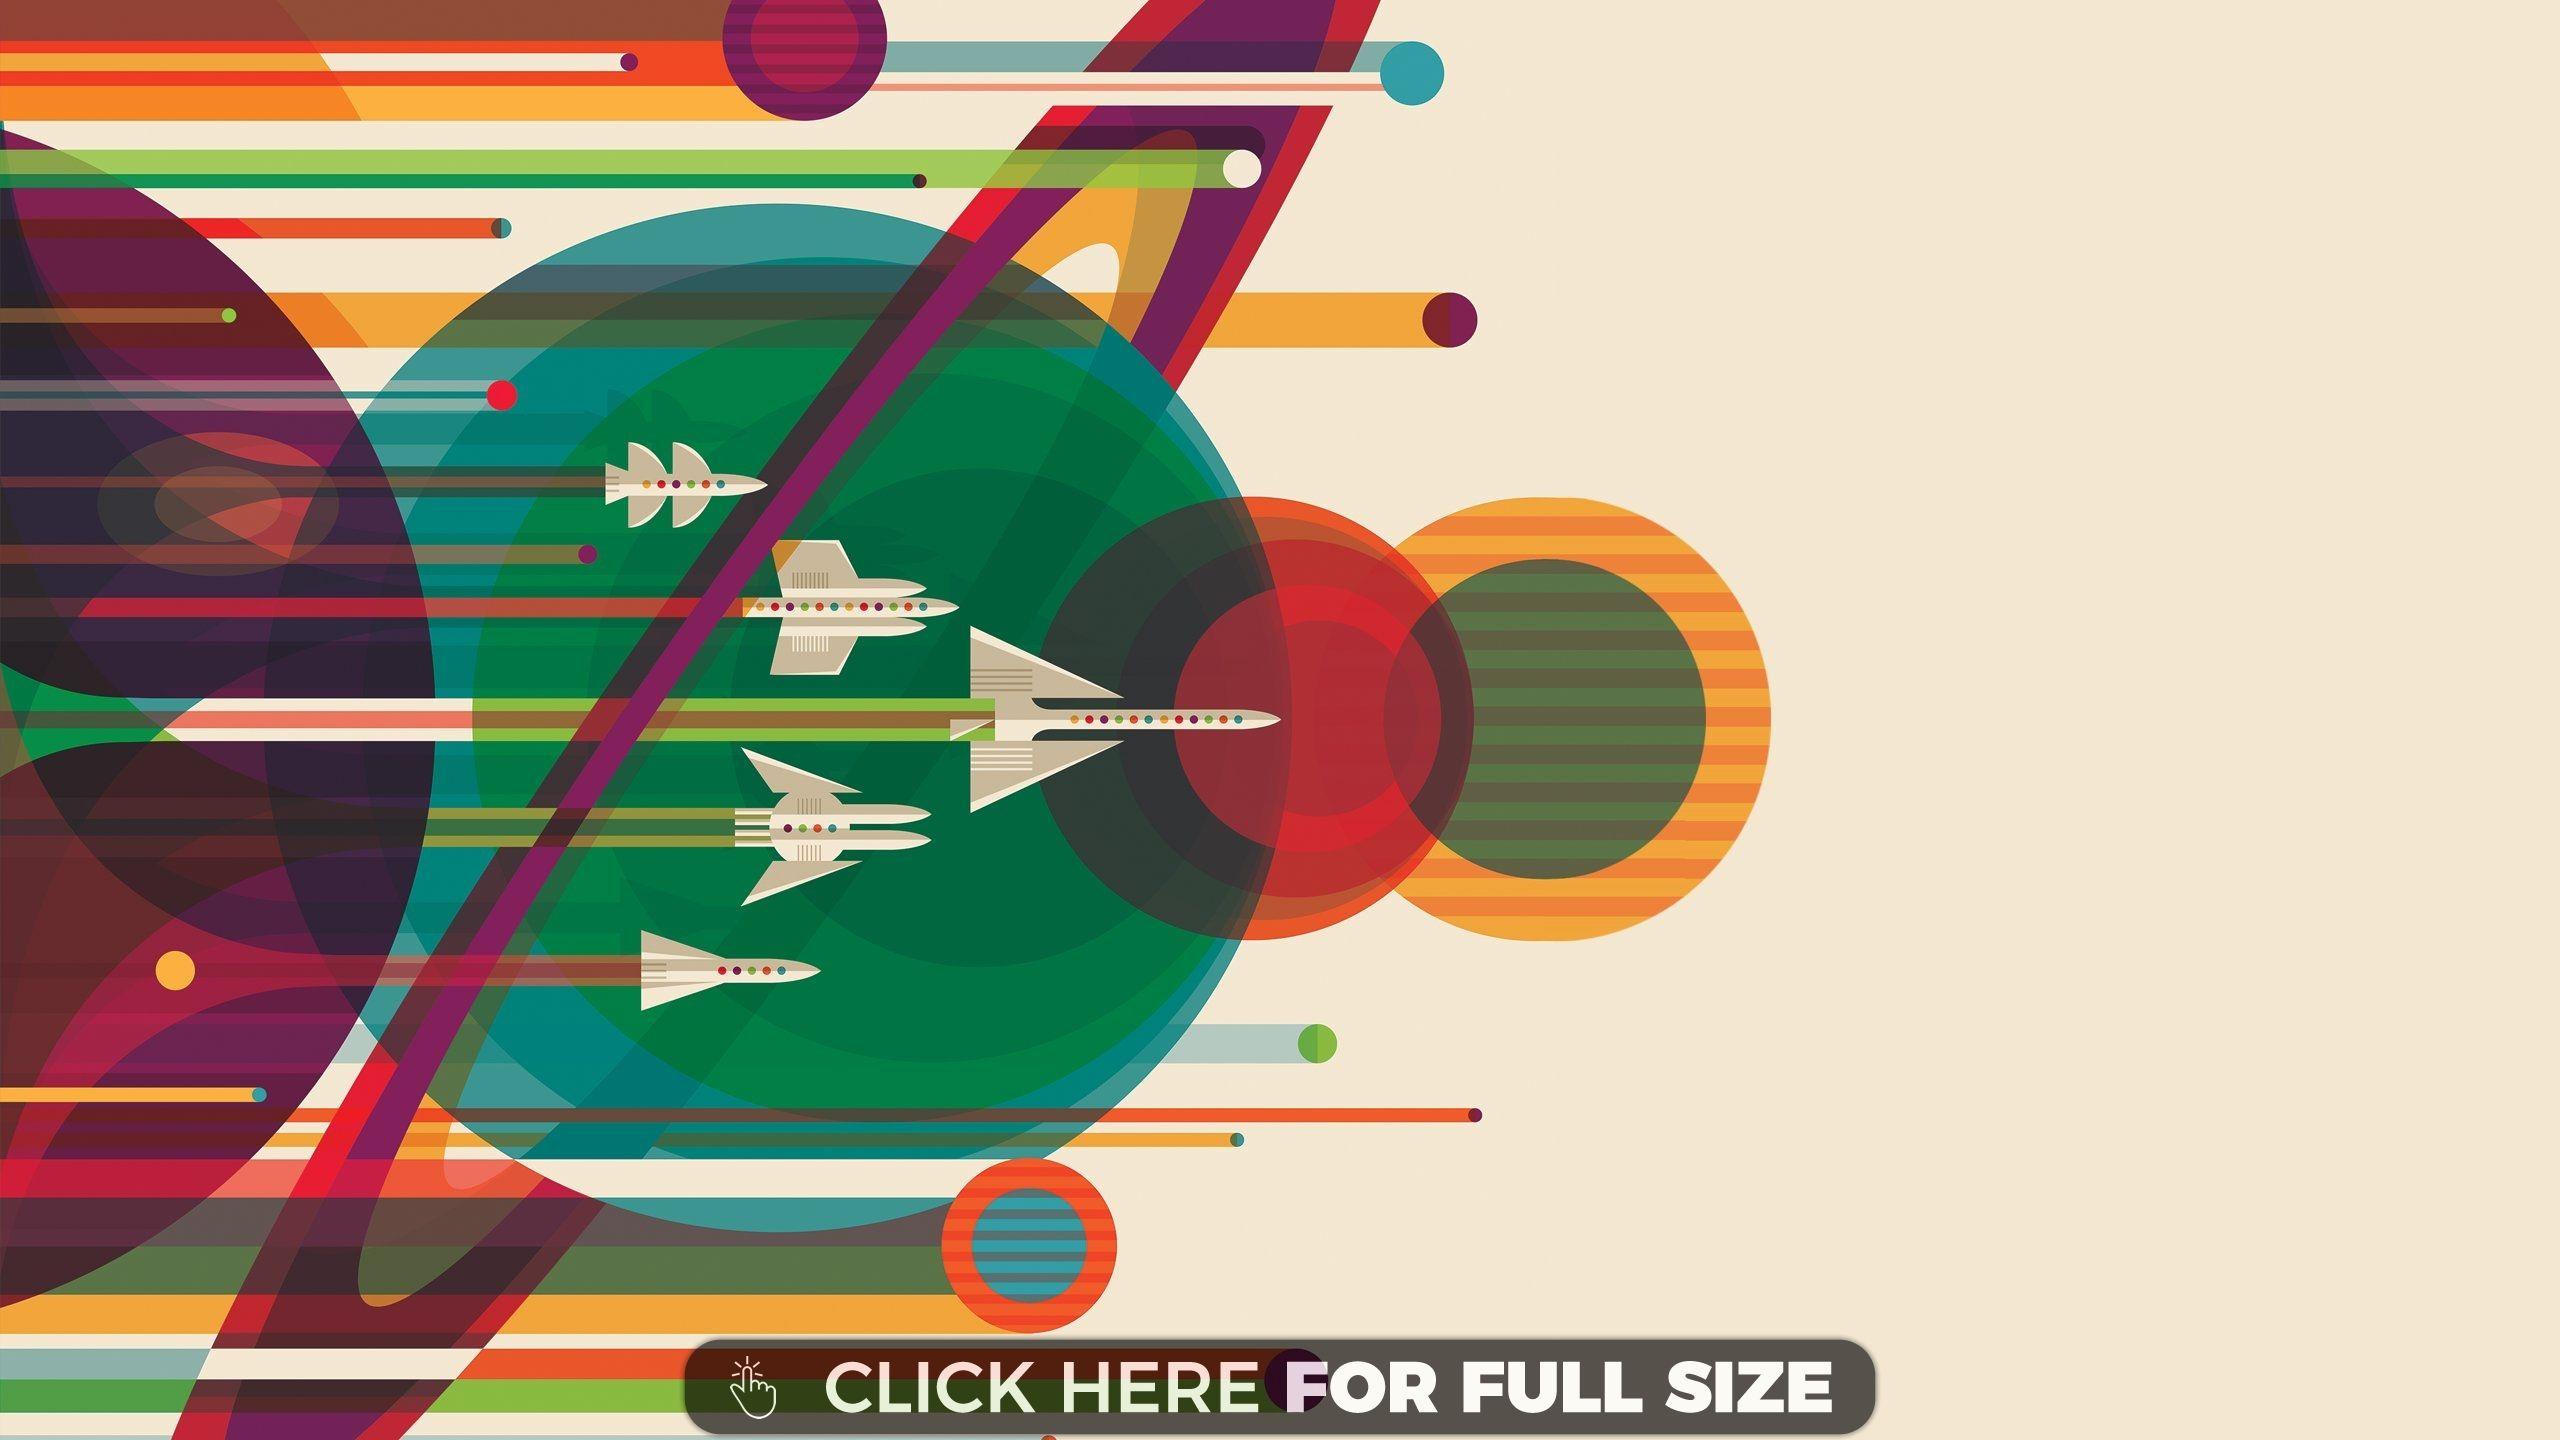 Nasa The Grand Tour Hd Wallpaper Android Wallpaper Space Android Wallpaper Android Wallpaper Black